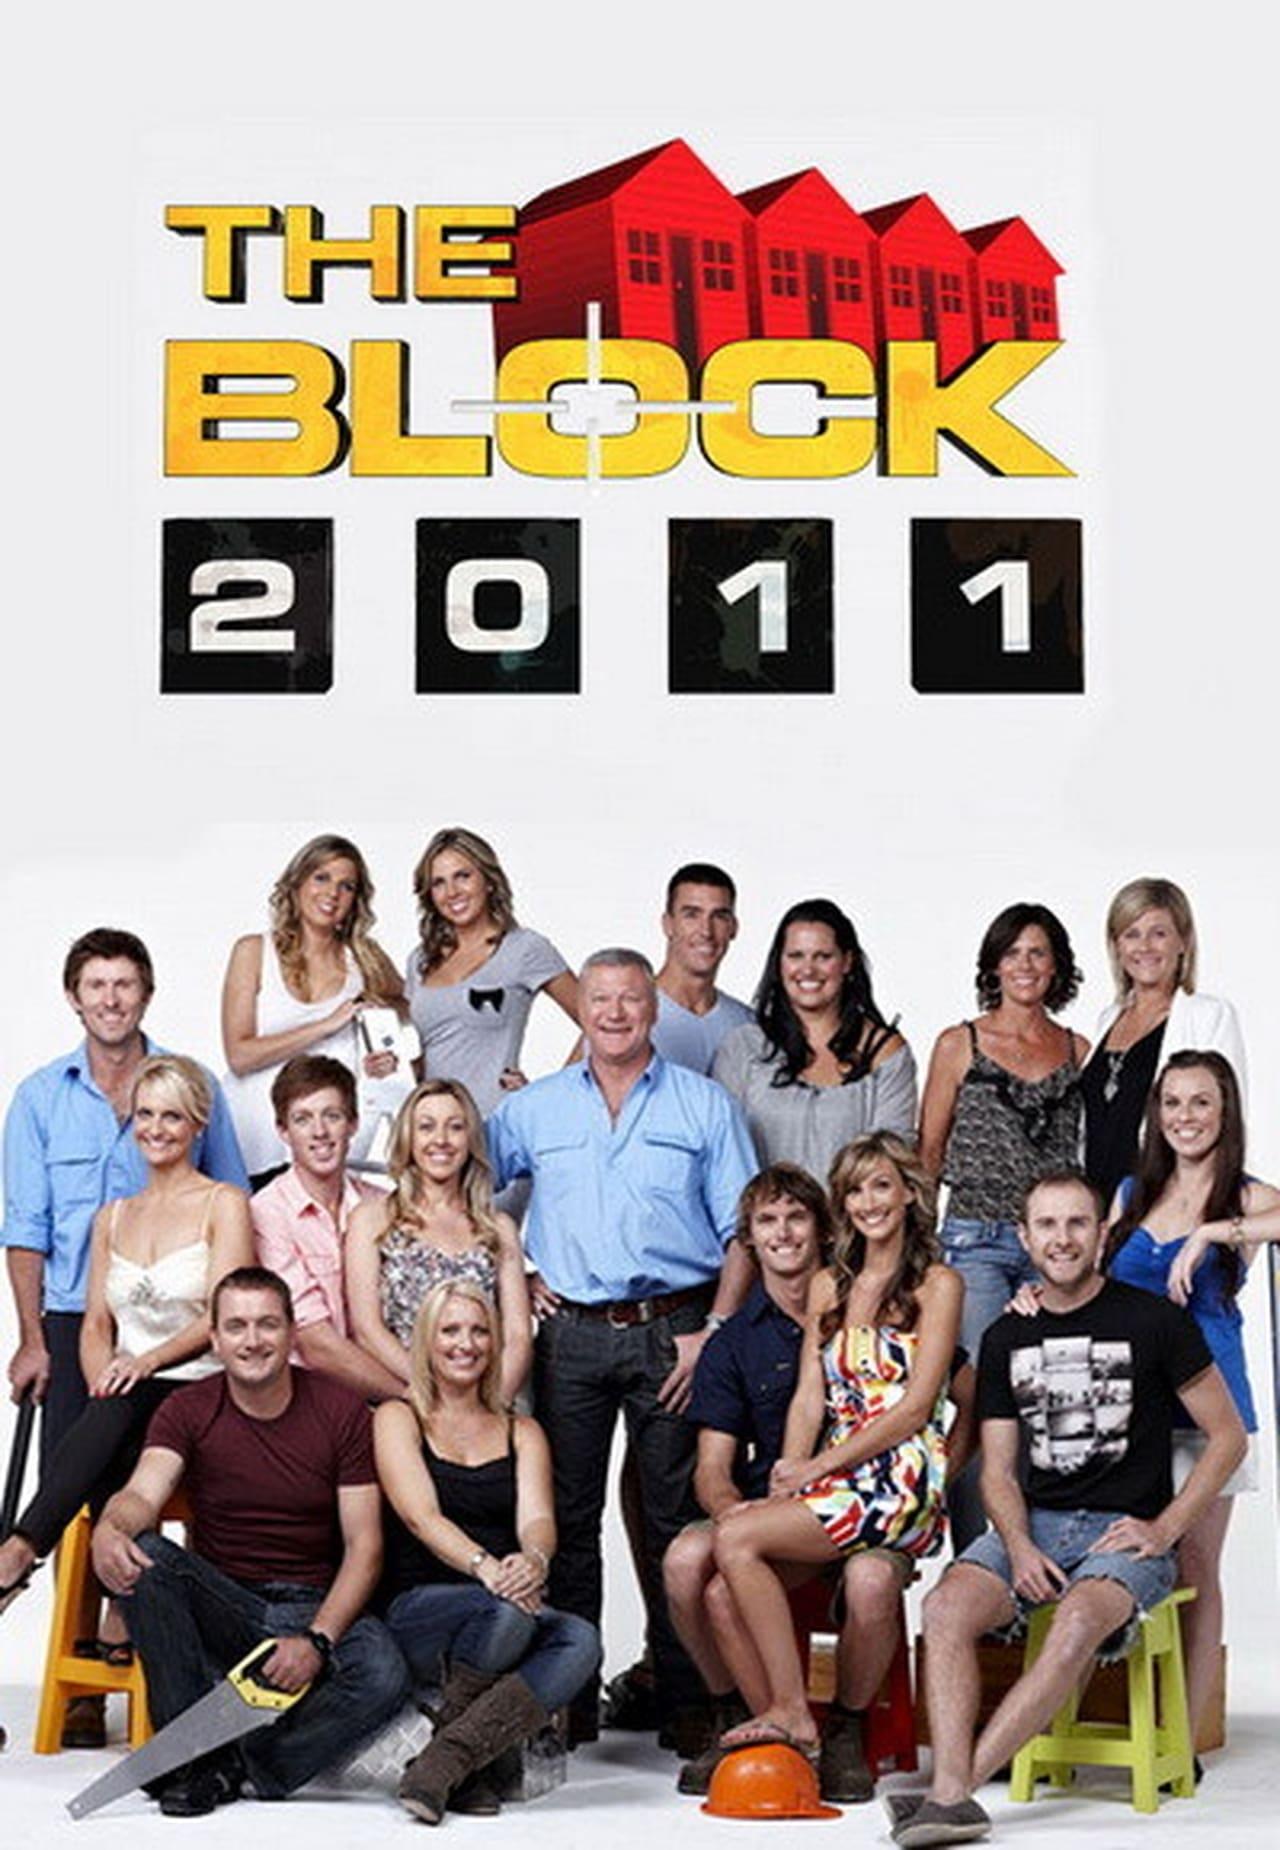 The Block Season 4 (2011) putlockers cafe